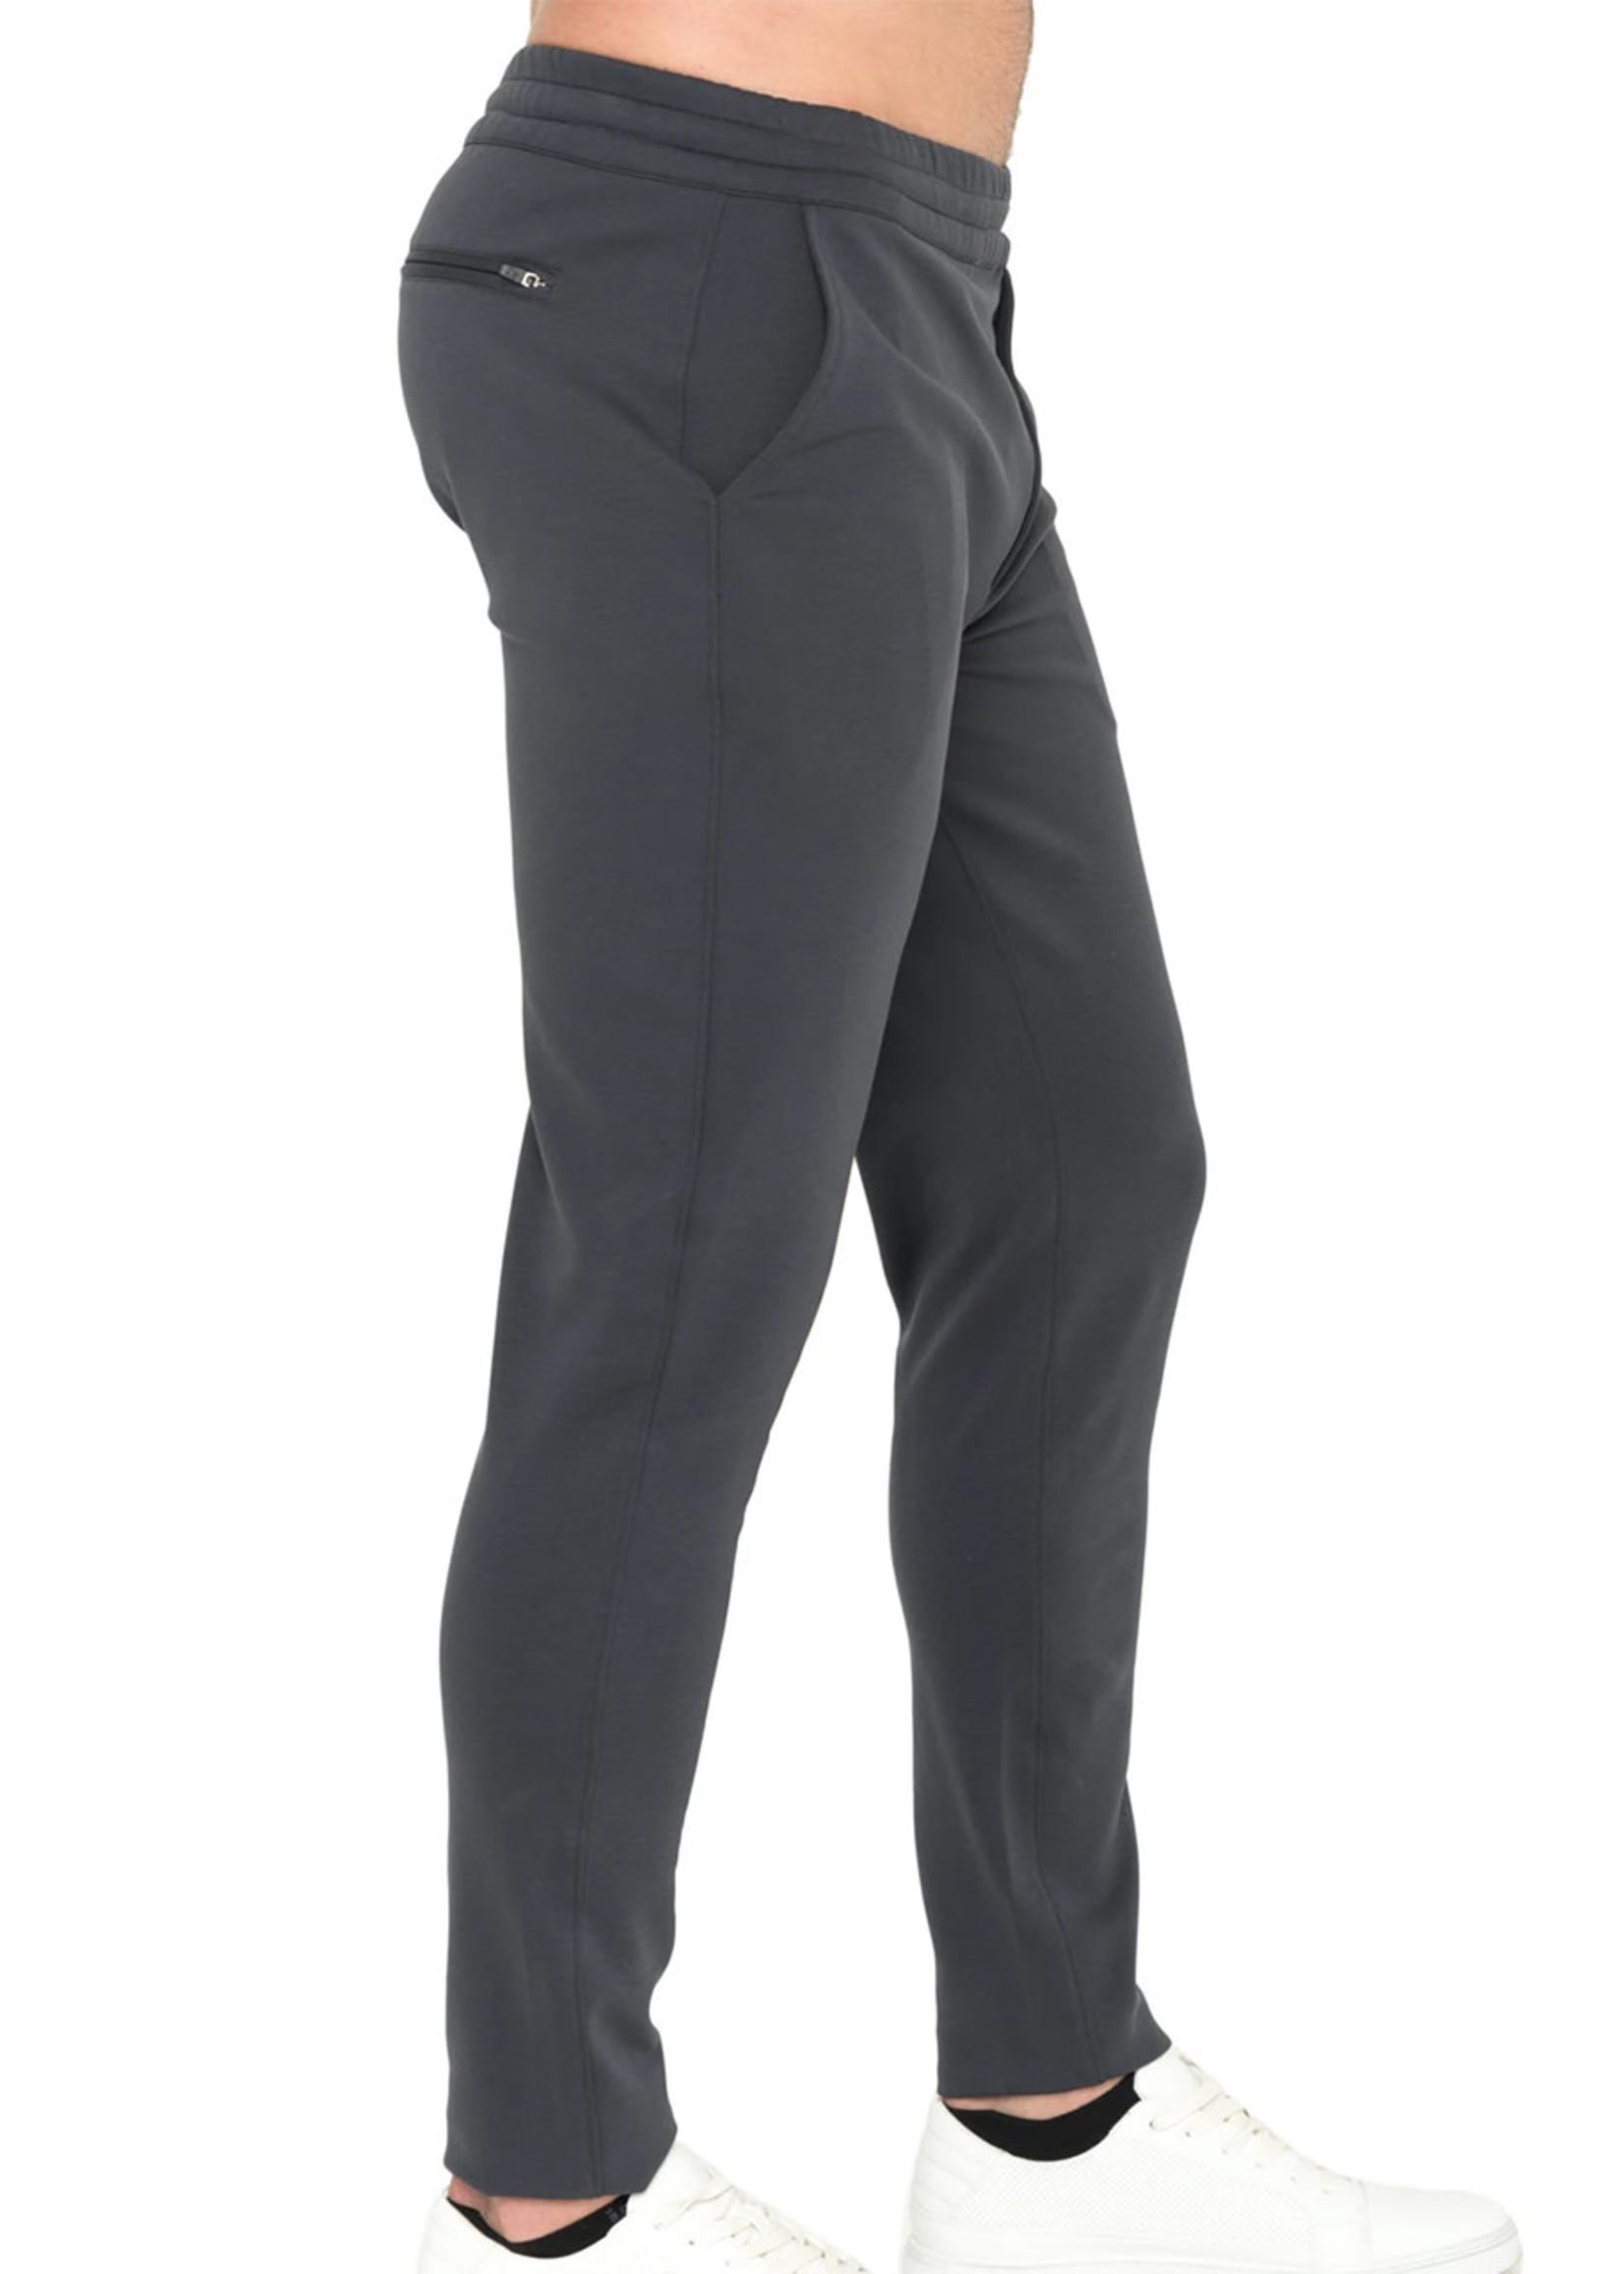 Raffi Raffi Easy Pant Charcoal Aqua Cotton